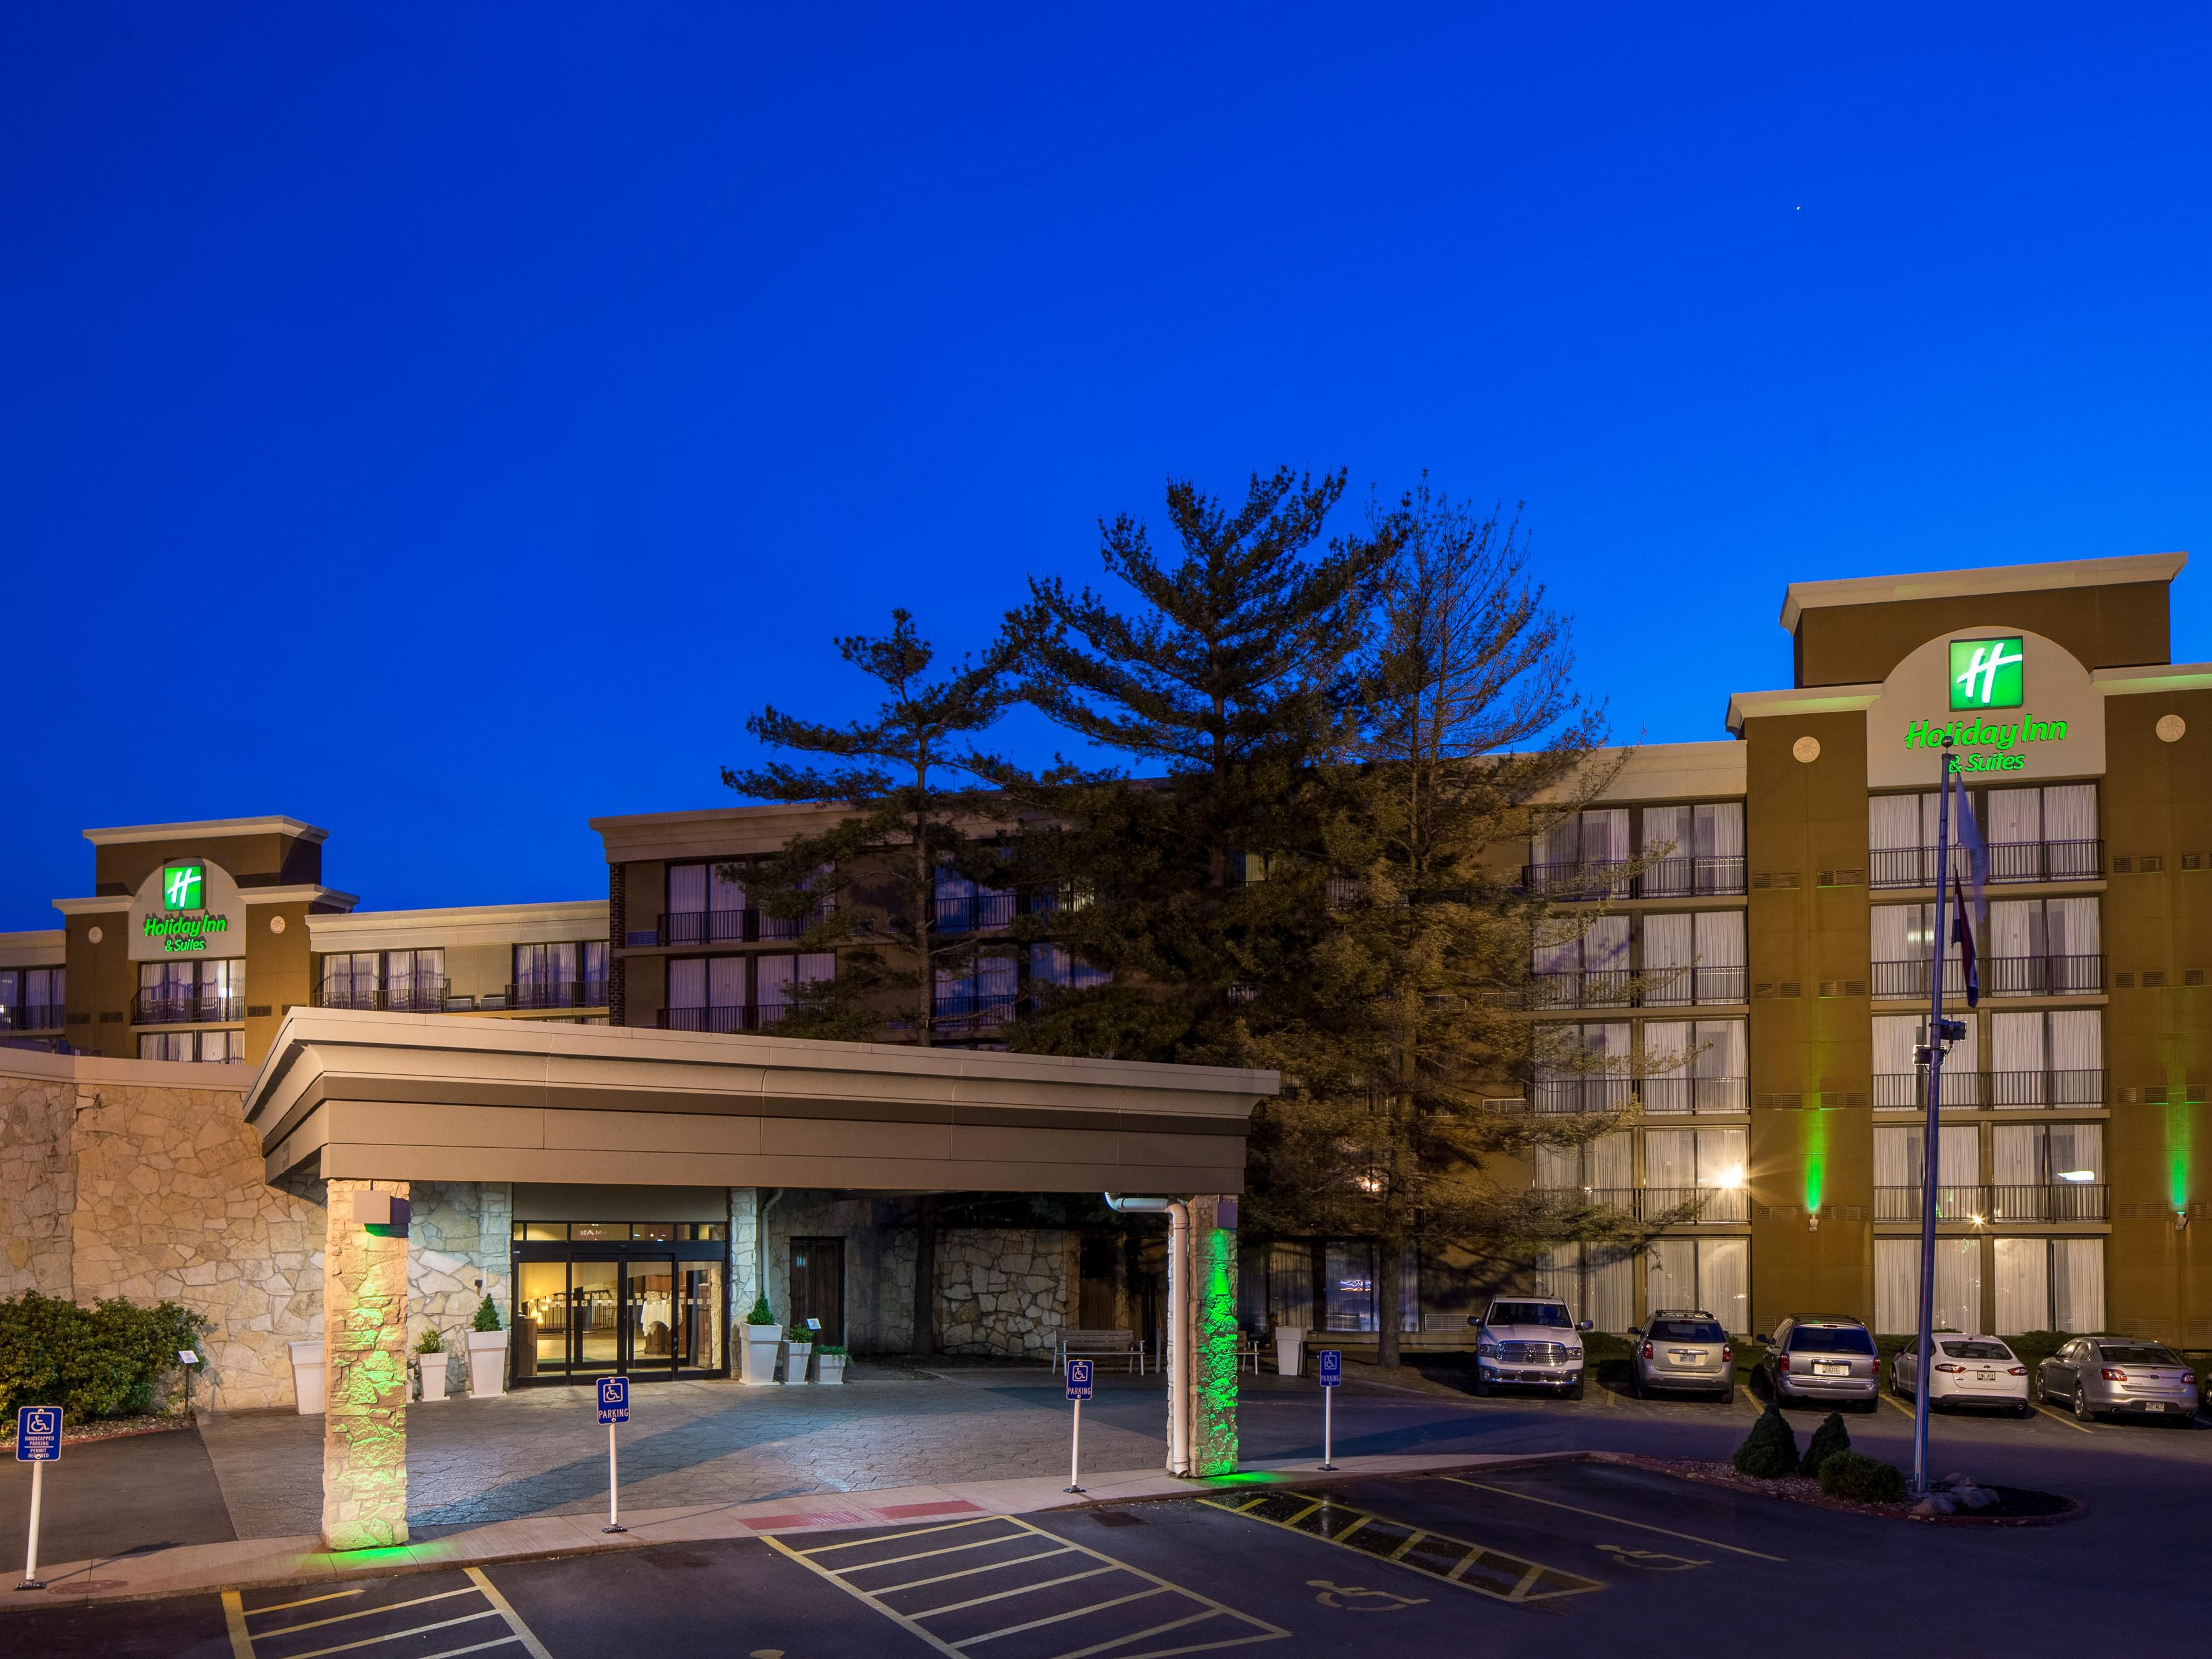 Urbandale Ia Hotel 2018 World 39 S Best Hotels